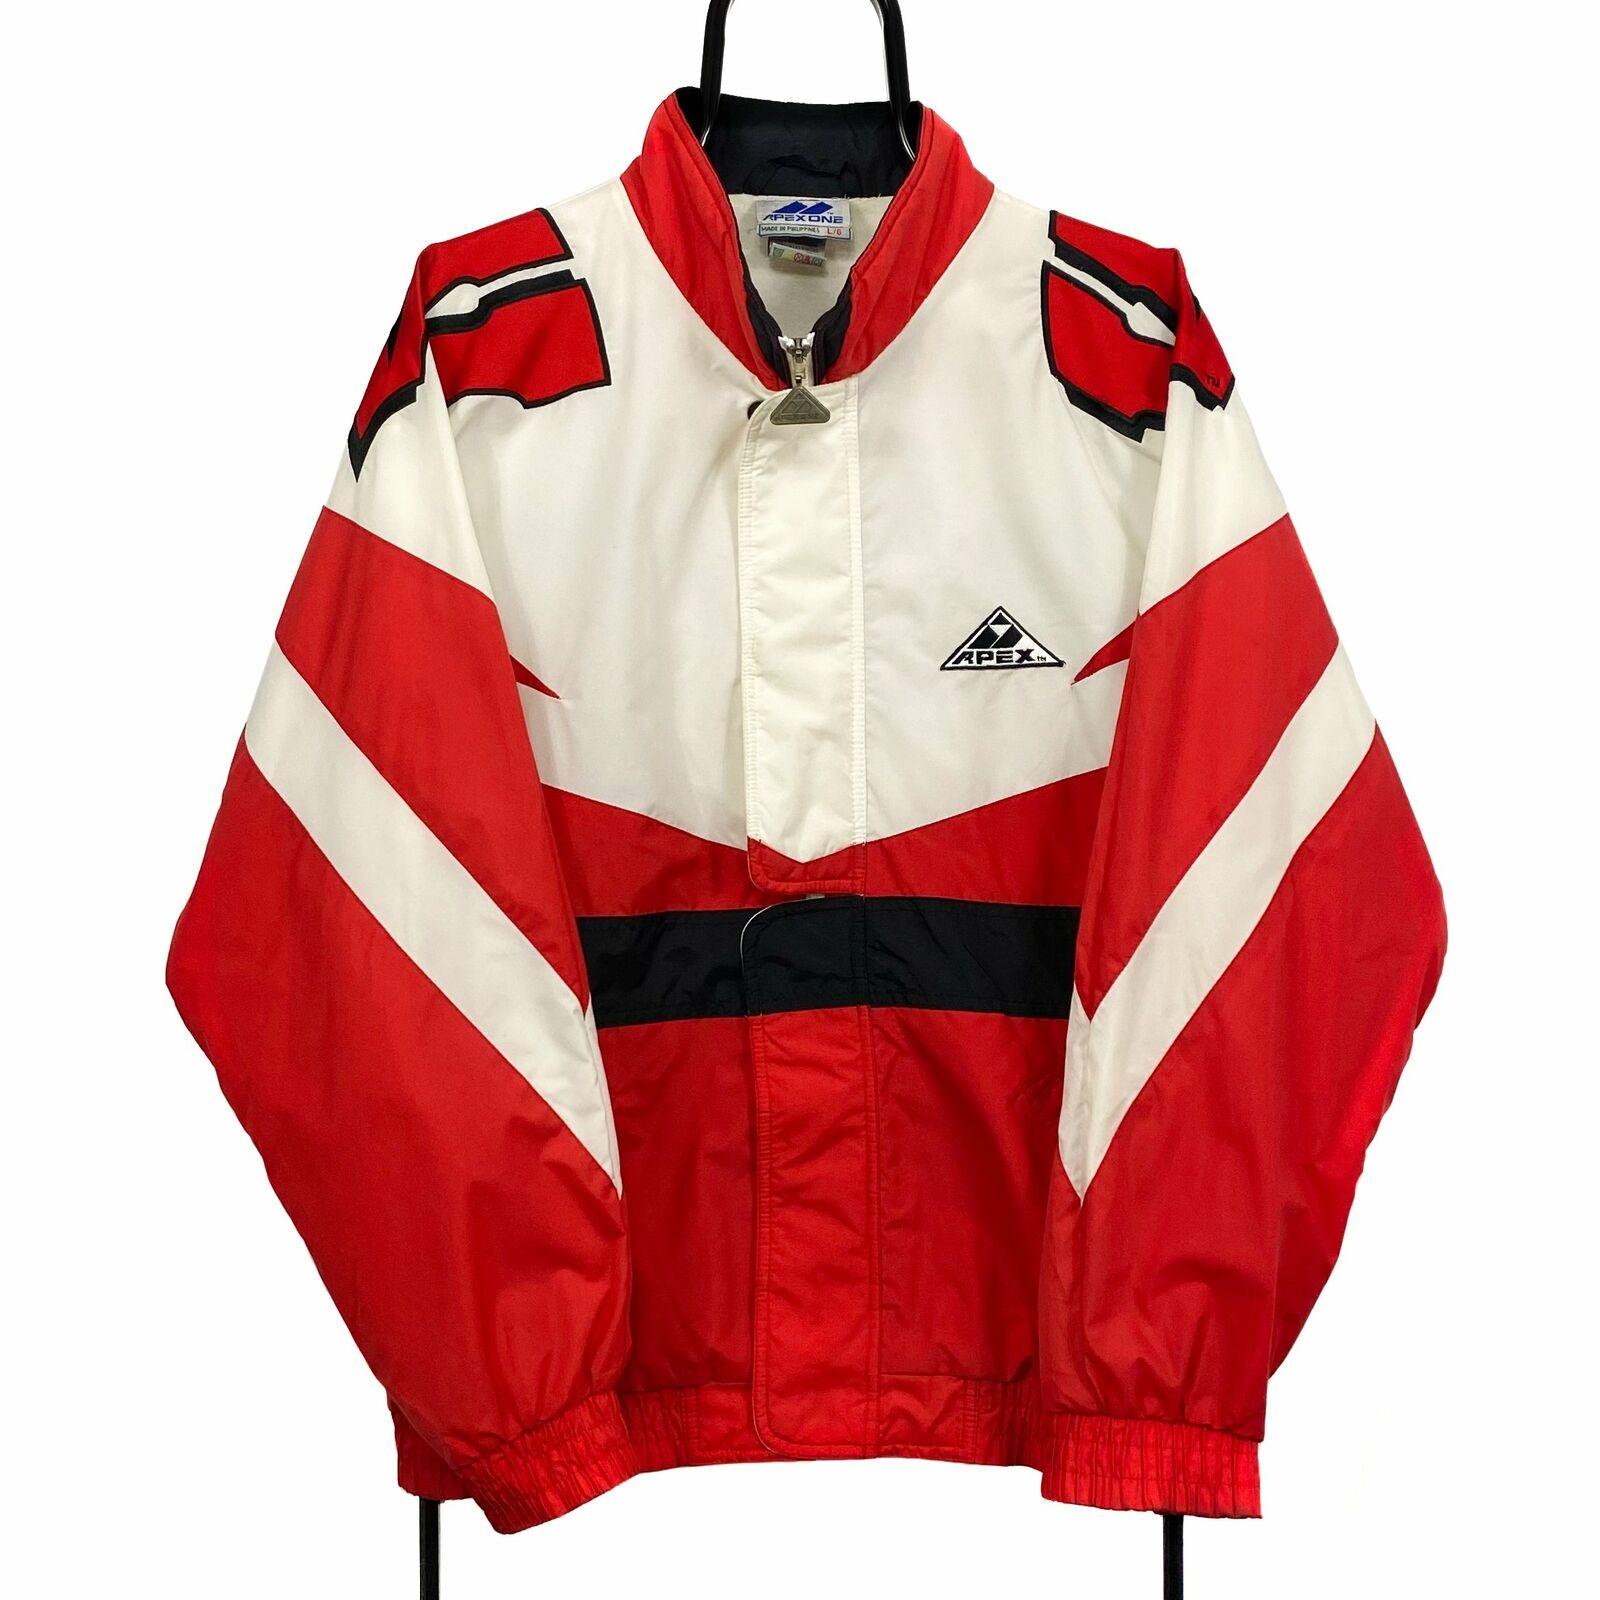 APEX ONE NCAA Wisconsin Badgers College Colour Block Windbreaker Jacket Large